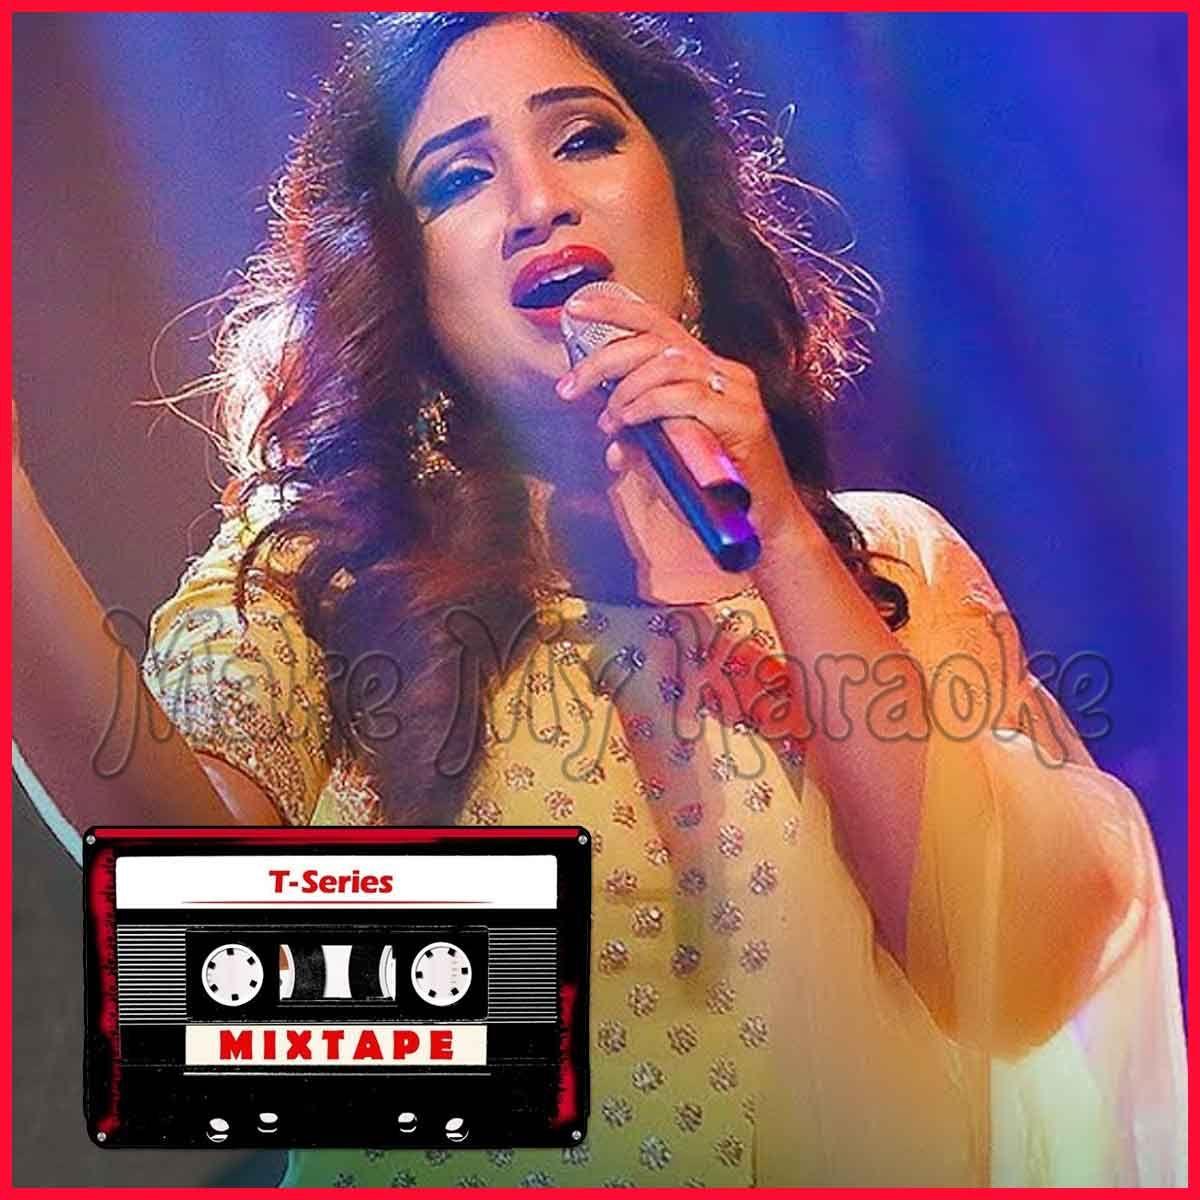 Sunn Raha Hai Rozana T Series Mixtape Mp3 And Video Karaoke Format Mixtape Karaoke Karaoke Songs